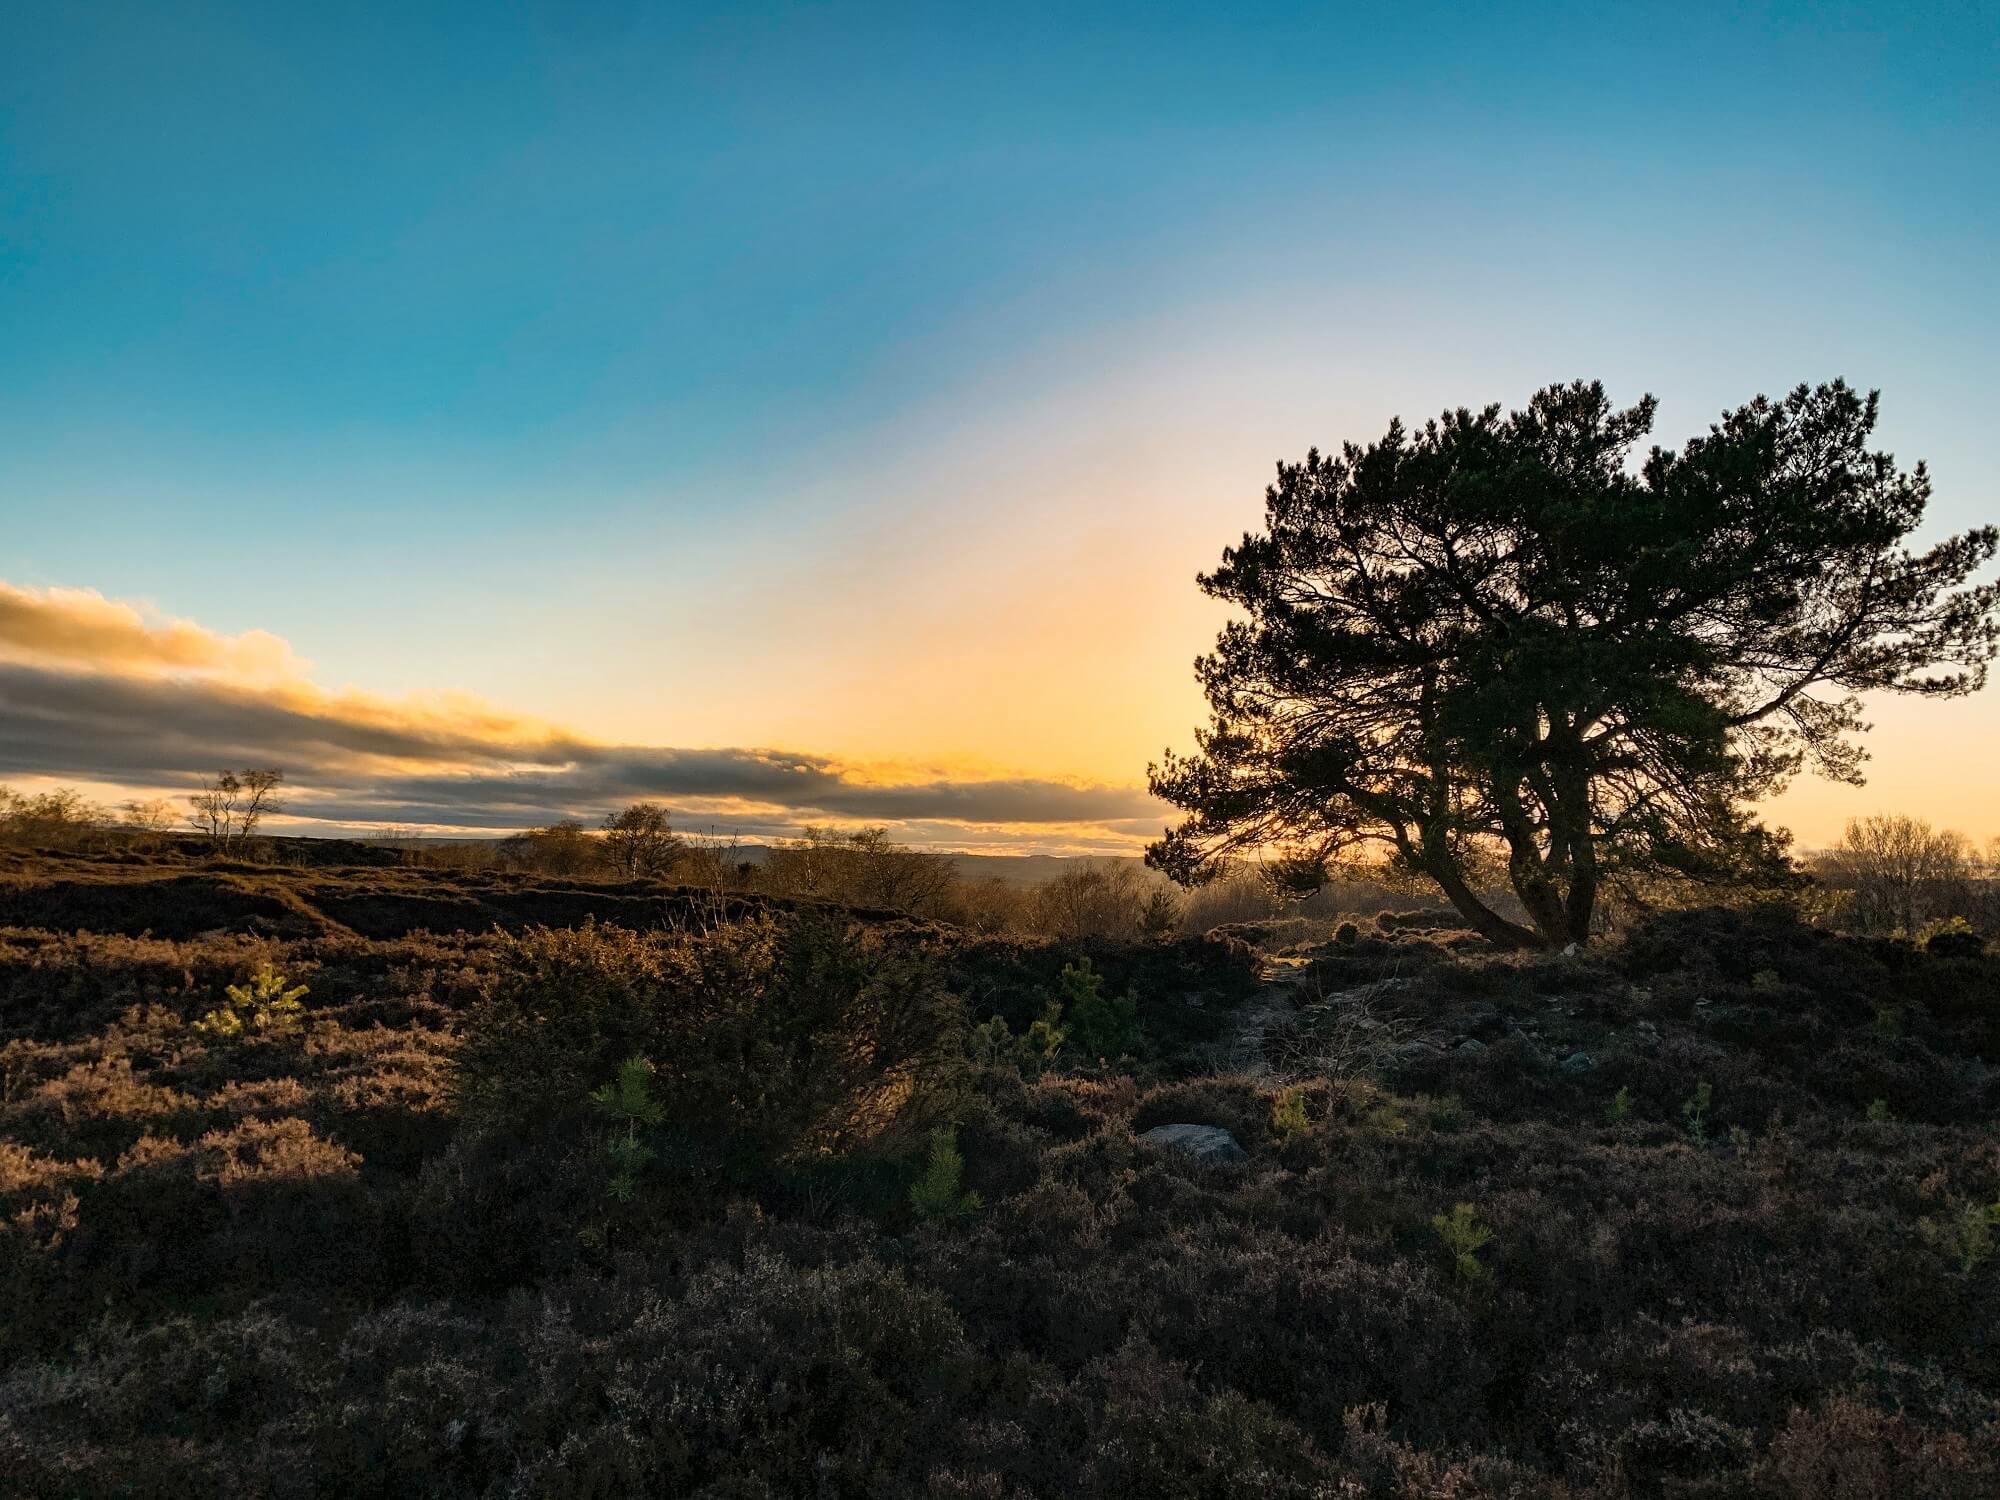 Sun setting over the Peak District landscape